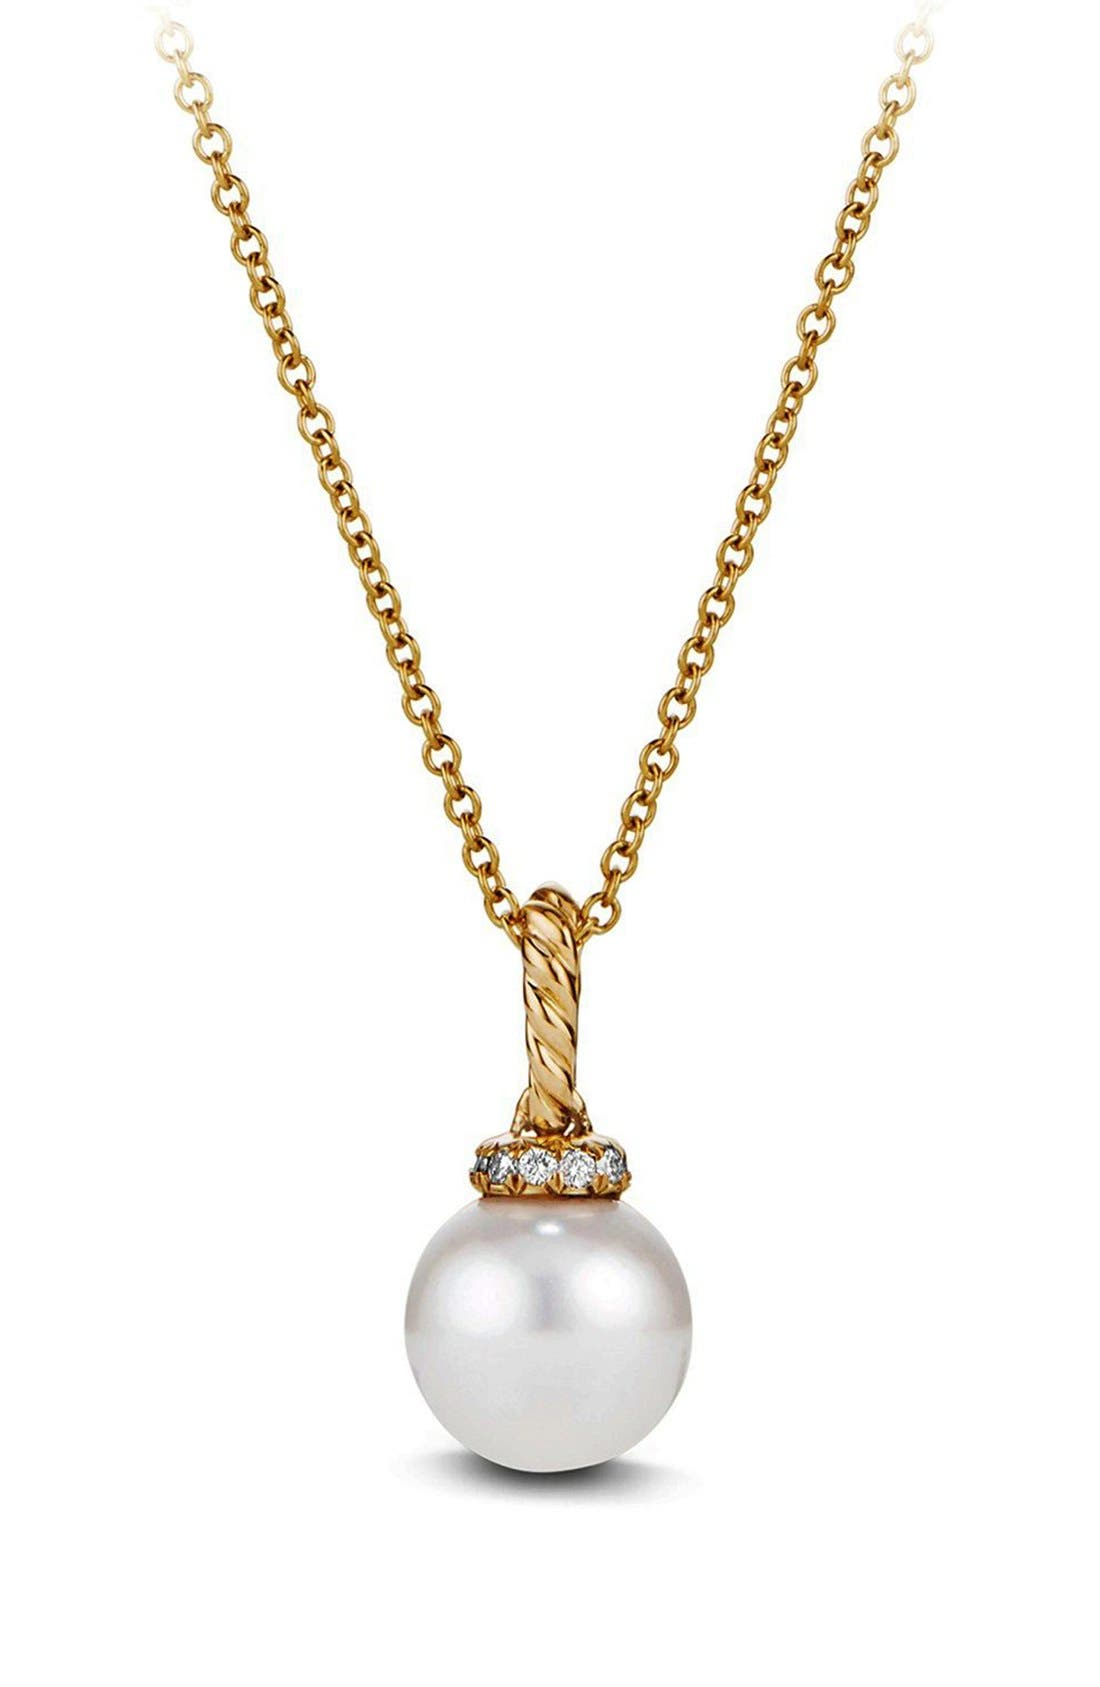 Main Image - David Yurman 'Solari' Pendant Necklace with Pearls and Diamonds in 18K Gold